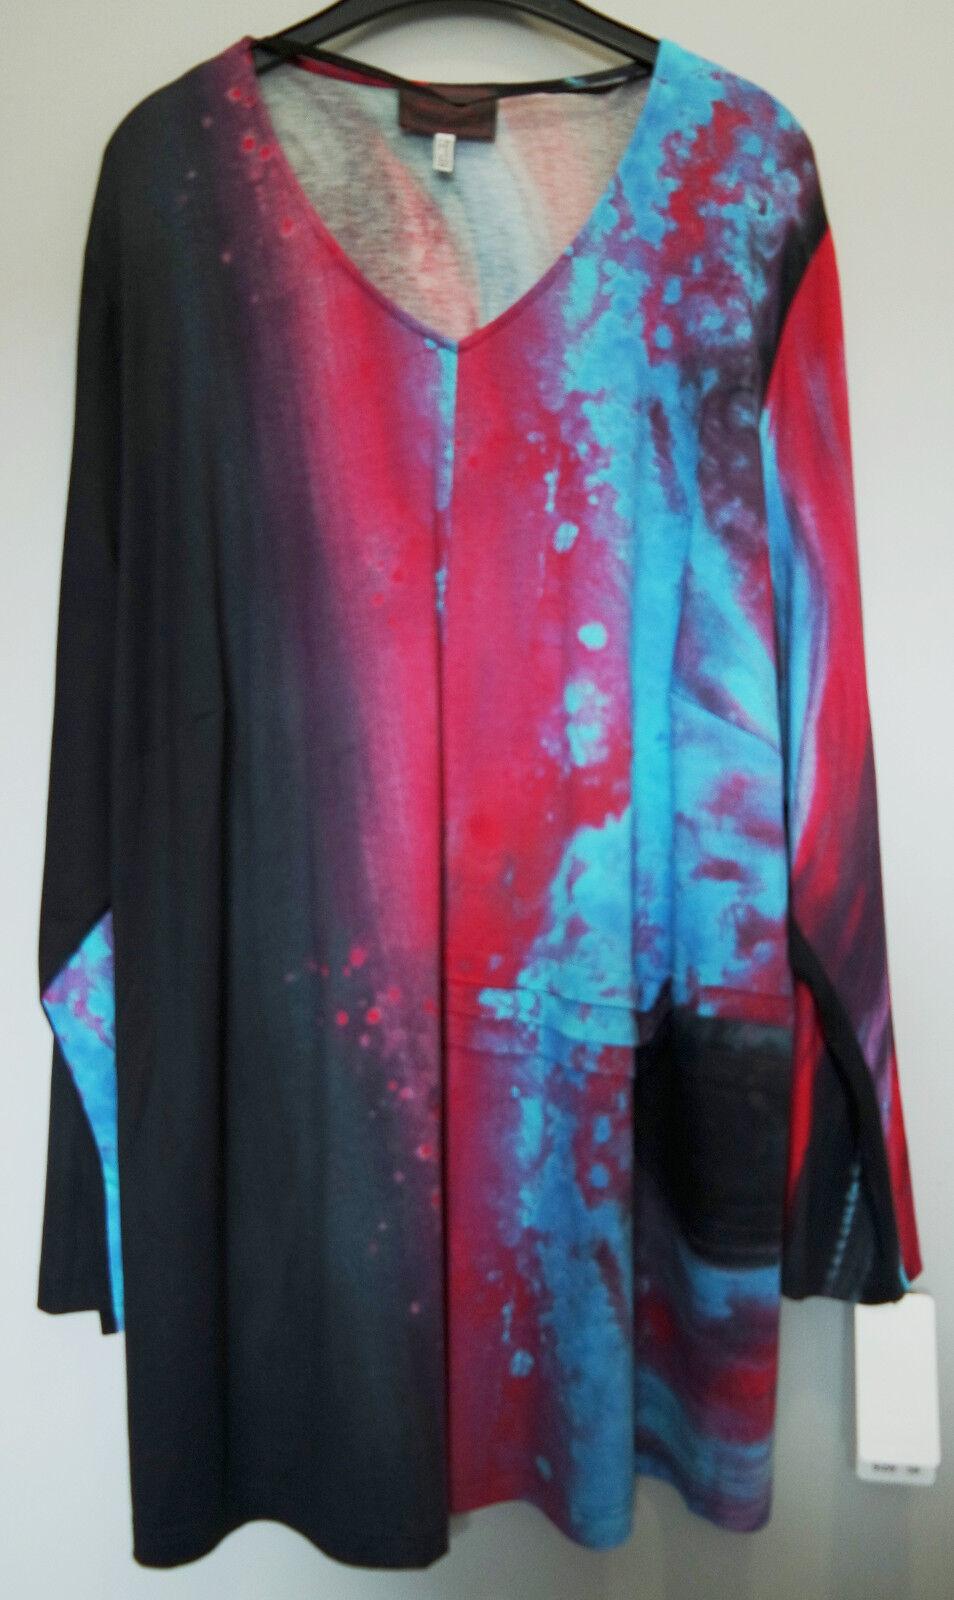 Shirt rot türkis schwarz Gr.48 Marke Sempre Piu by Chalou Viskose rot.1 2 Preis